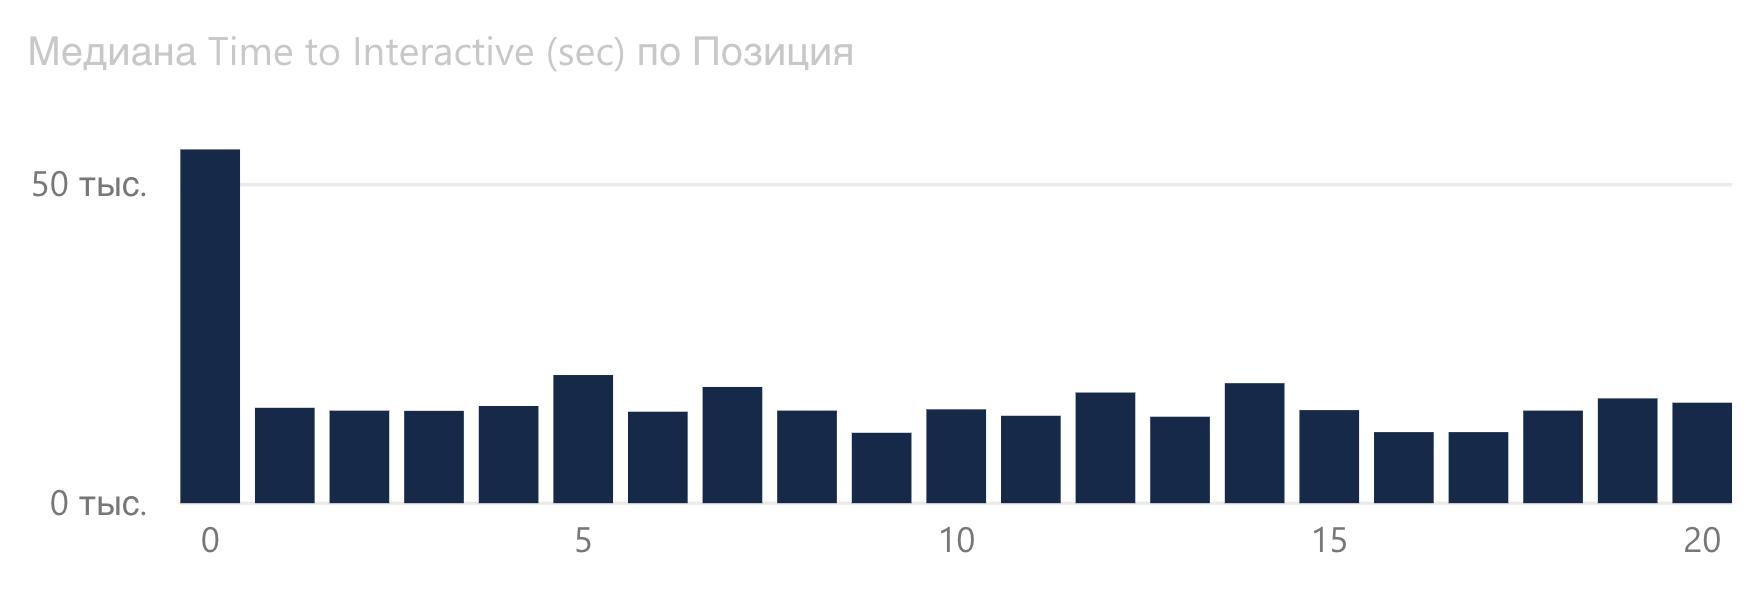 График зависимости Time to Interactive от позиции Google в сфере недвижимости.